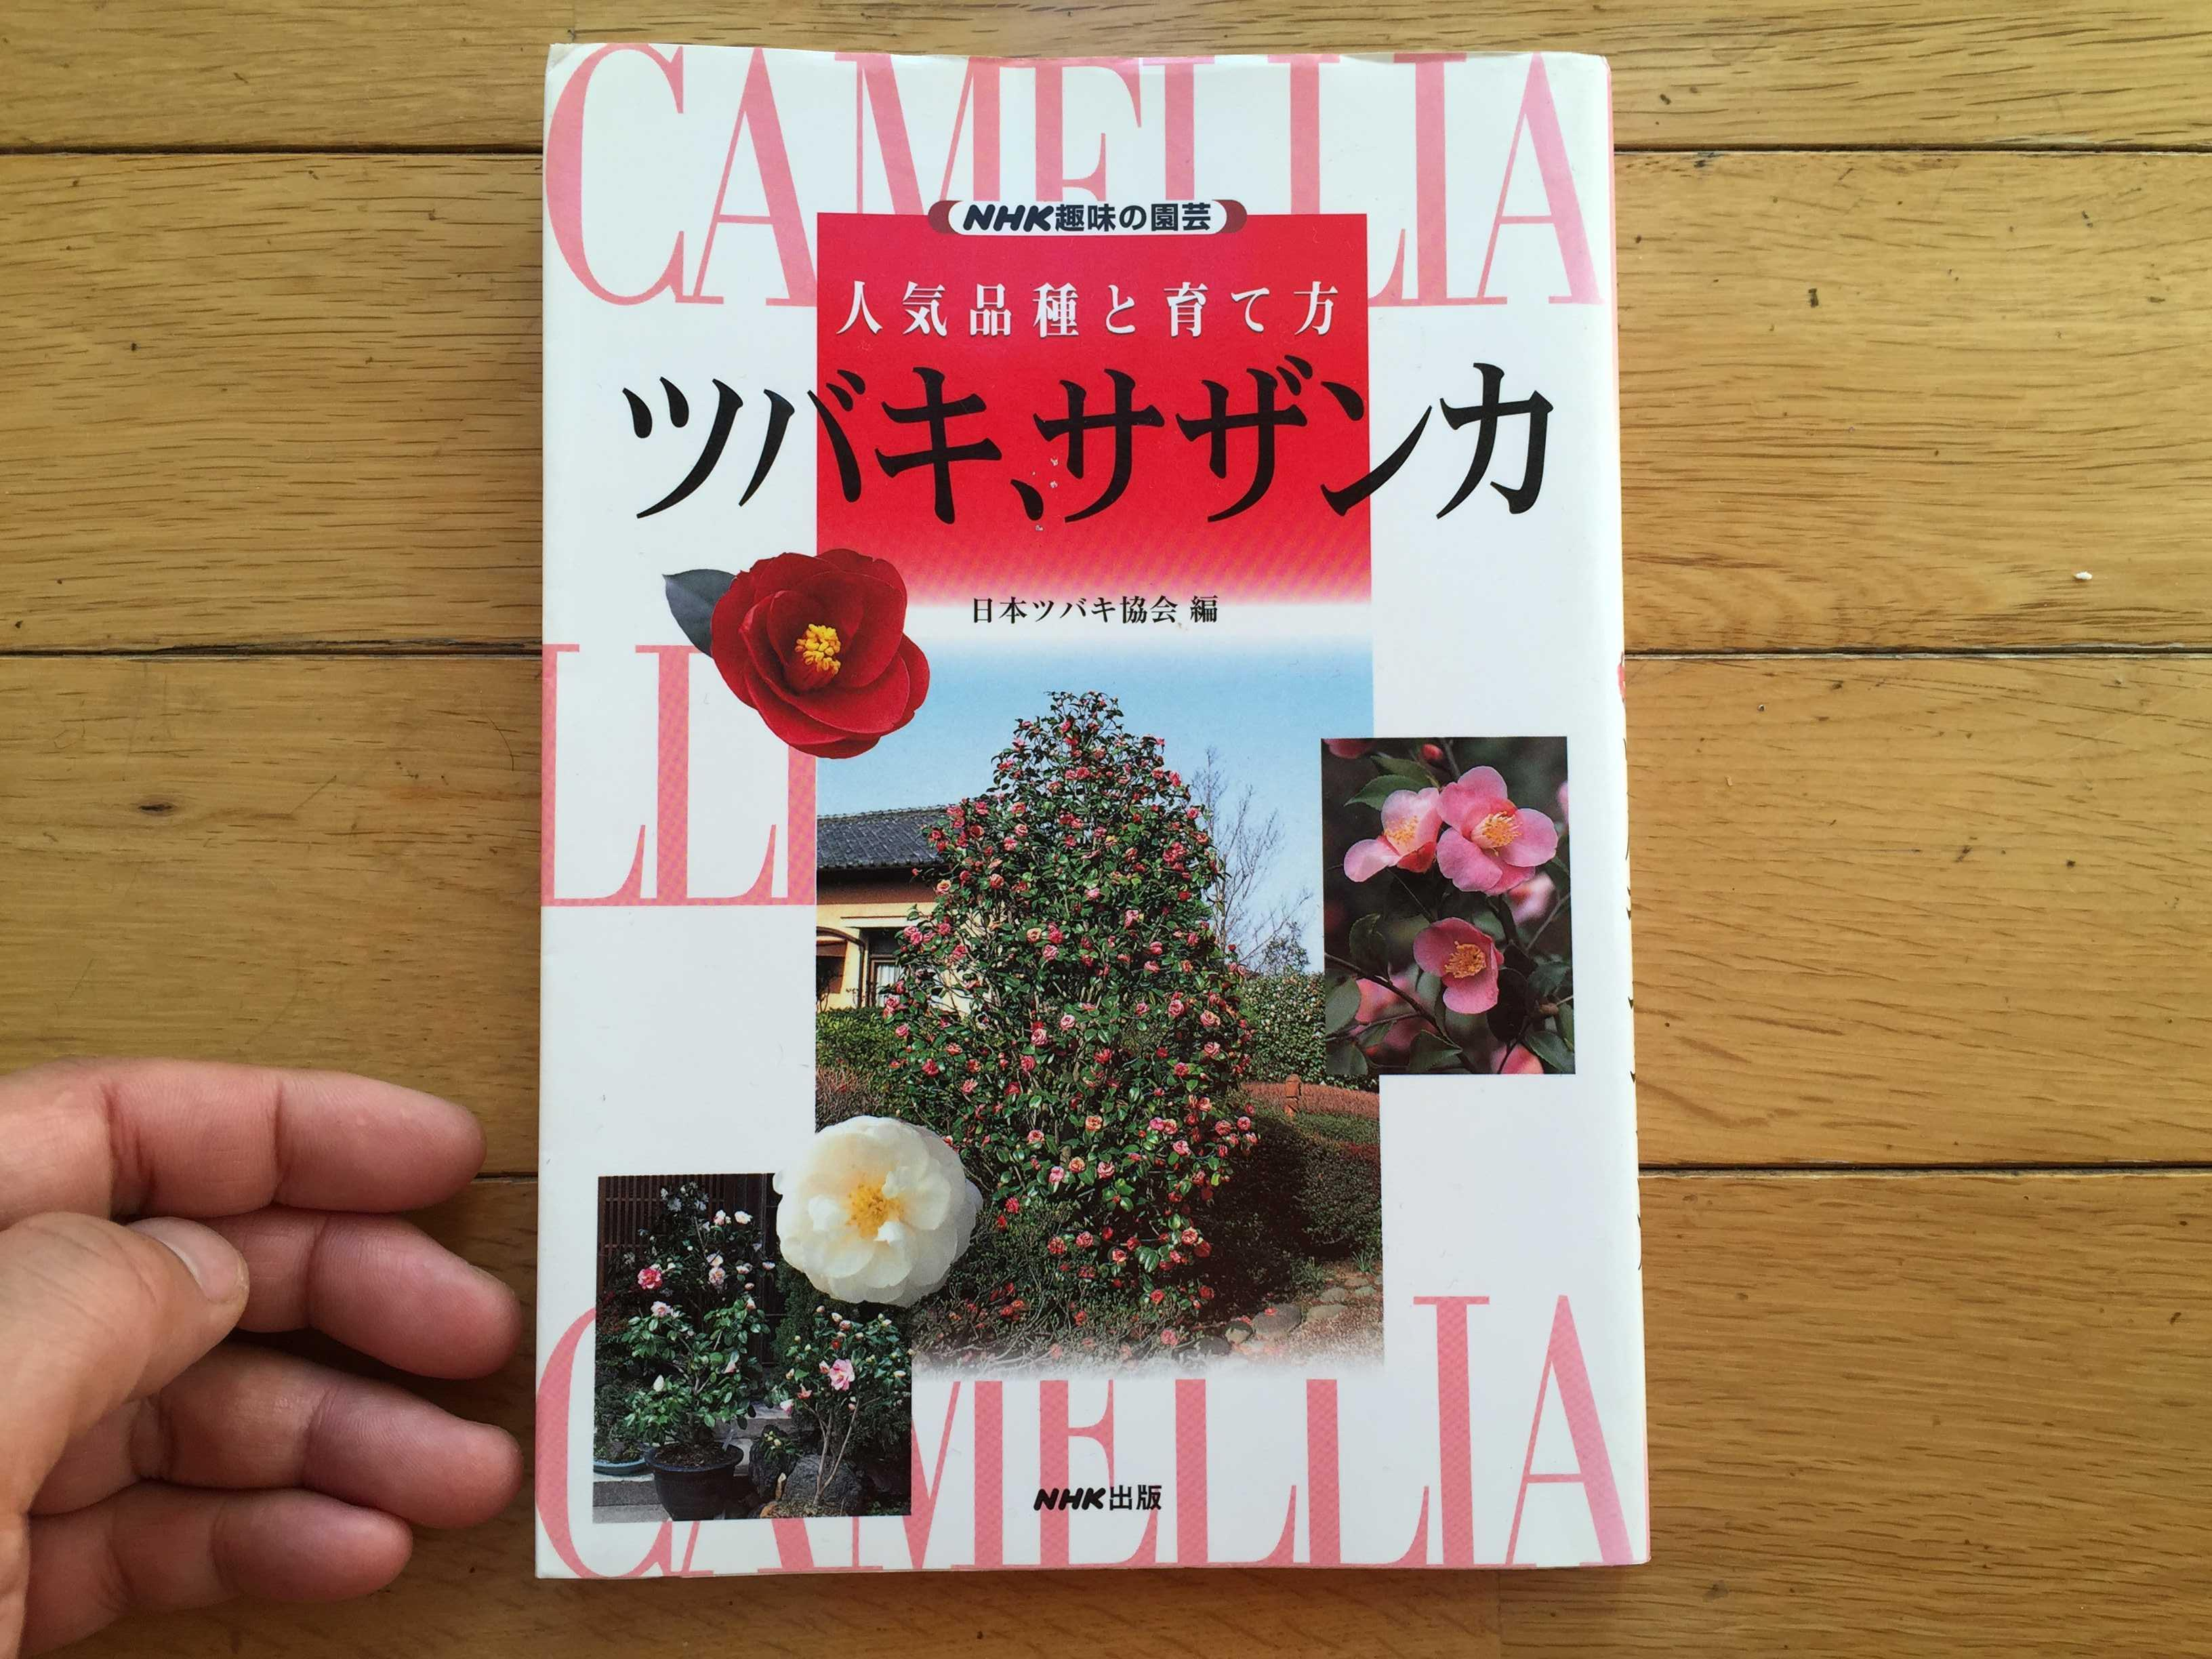 NHK趣味の園芸 人気品種と育て方 ツバキ、サザンカ - 日本ツバキ協会 編 NHK出版